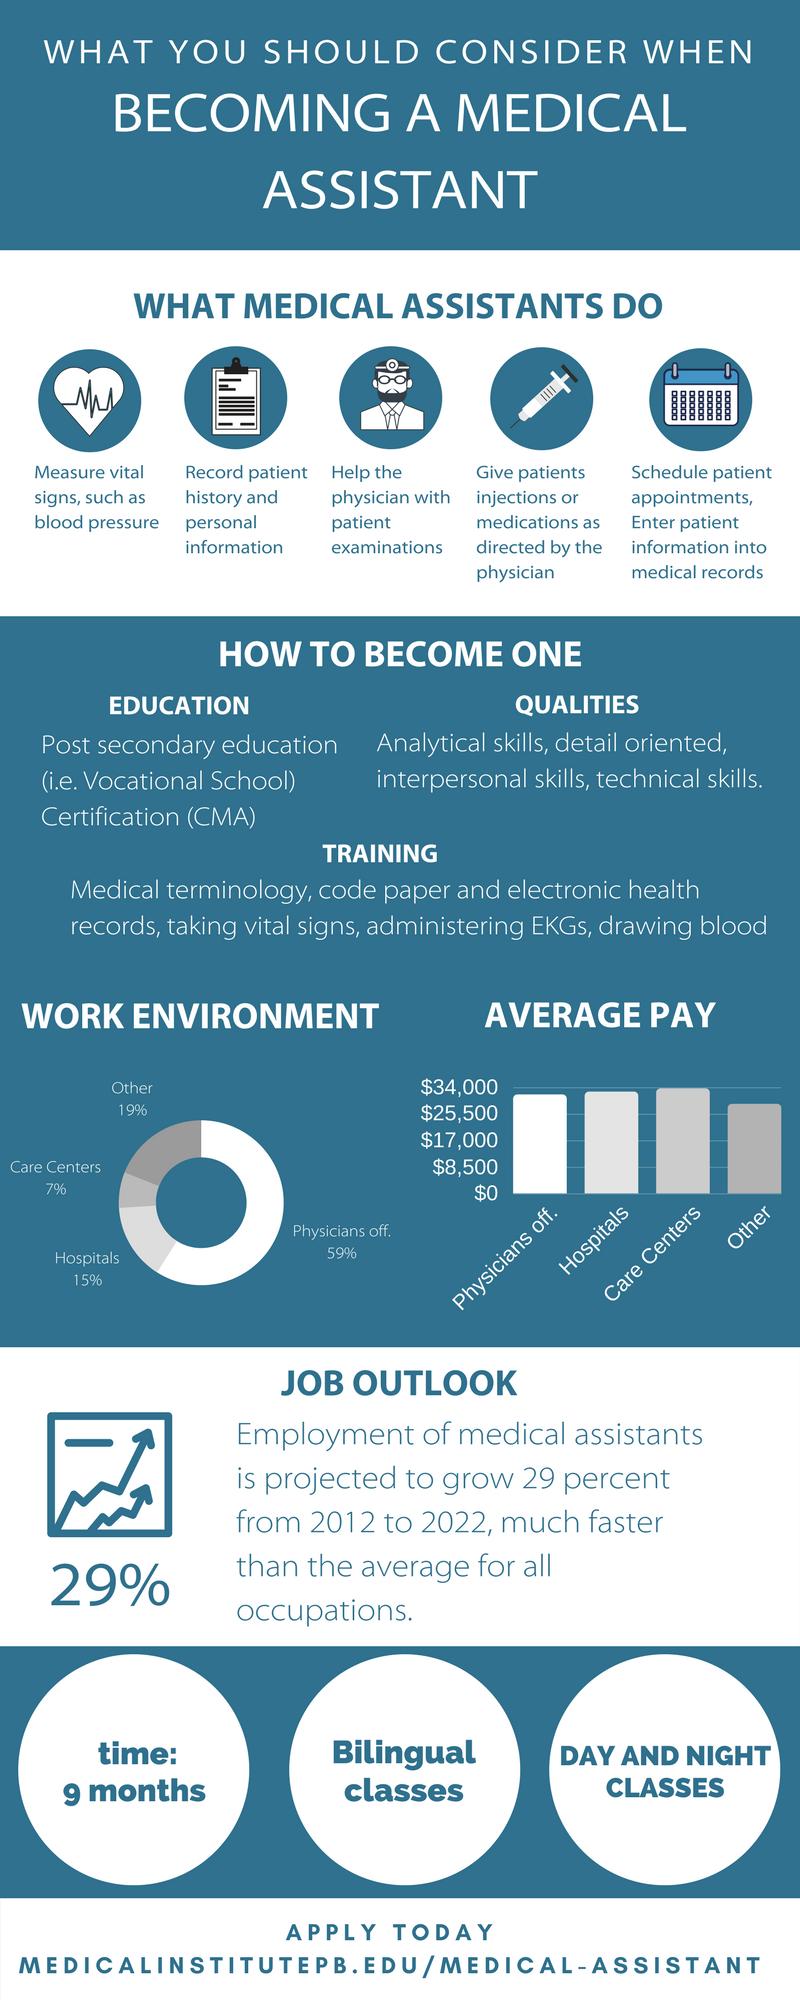 ** Bureau of Labor Statistics, U.S. Department of Labor,Occupational Outlook Handbook, 2016-17 Edition, Medical Assistants, on the Internet at  https://www.bls.gov/ooh/healthcare/medical-assistants.htm (visited  June 29, 2017 ).